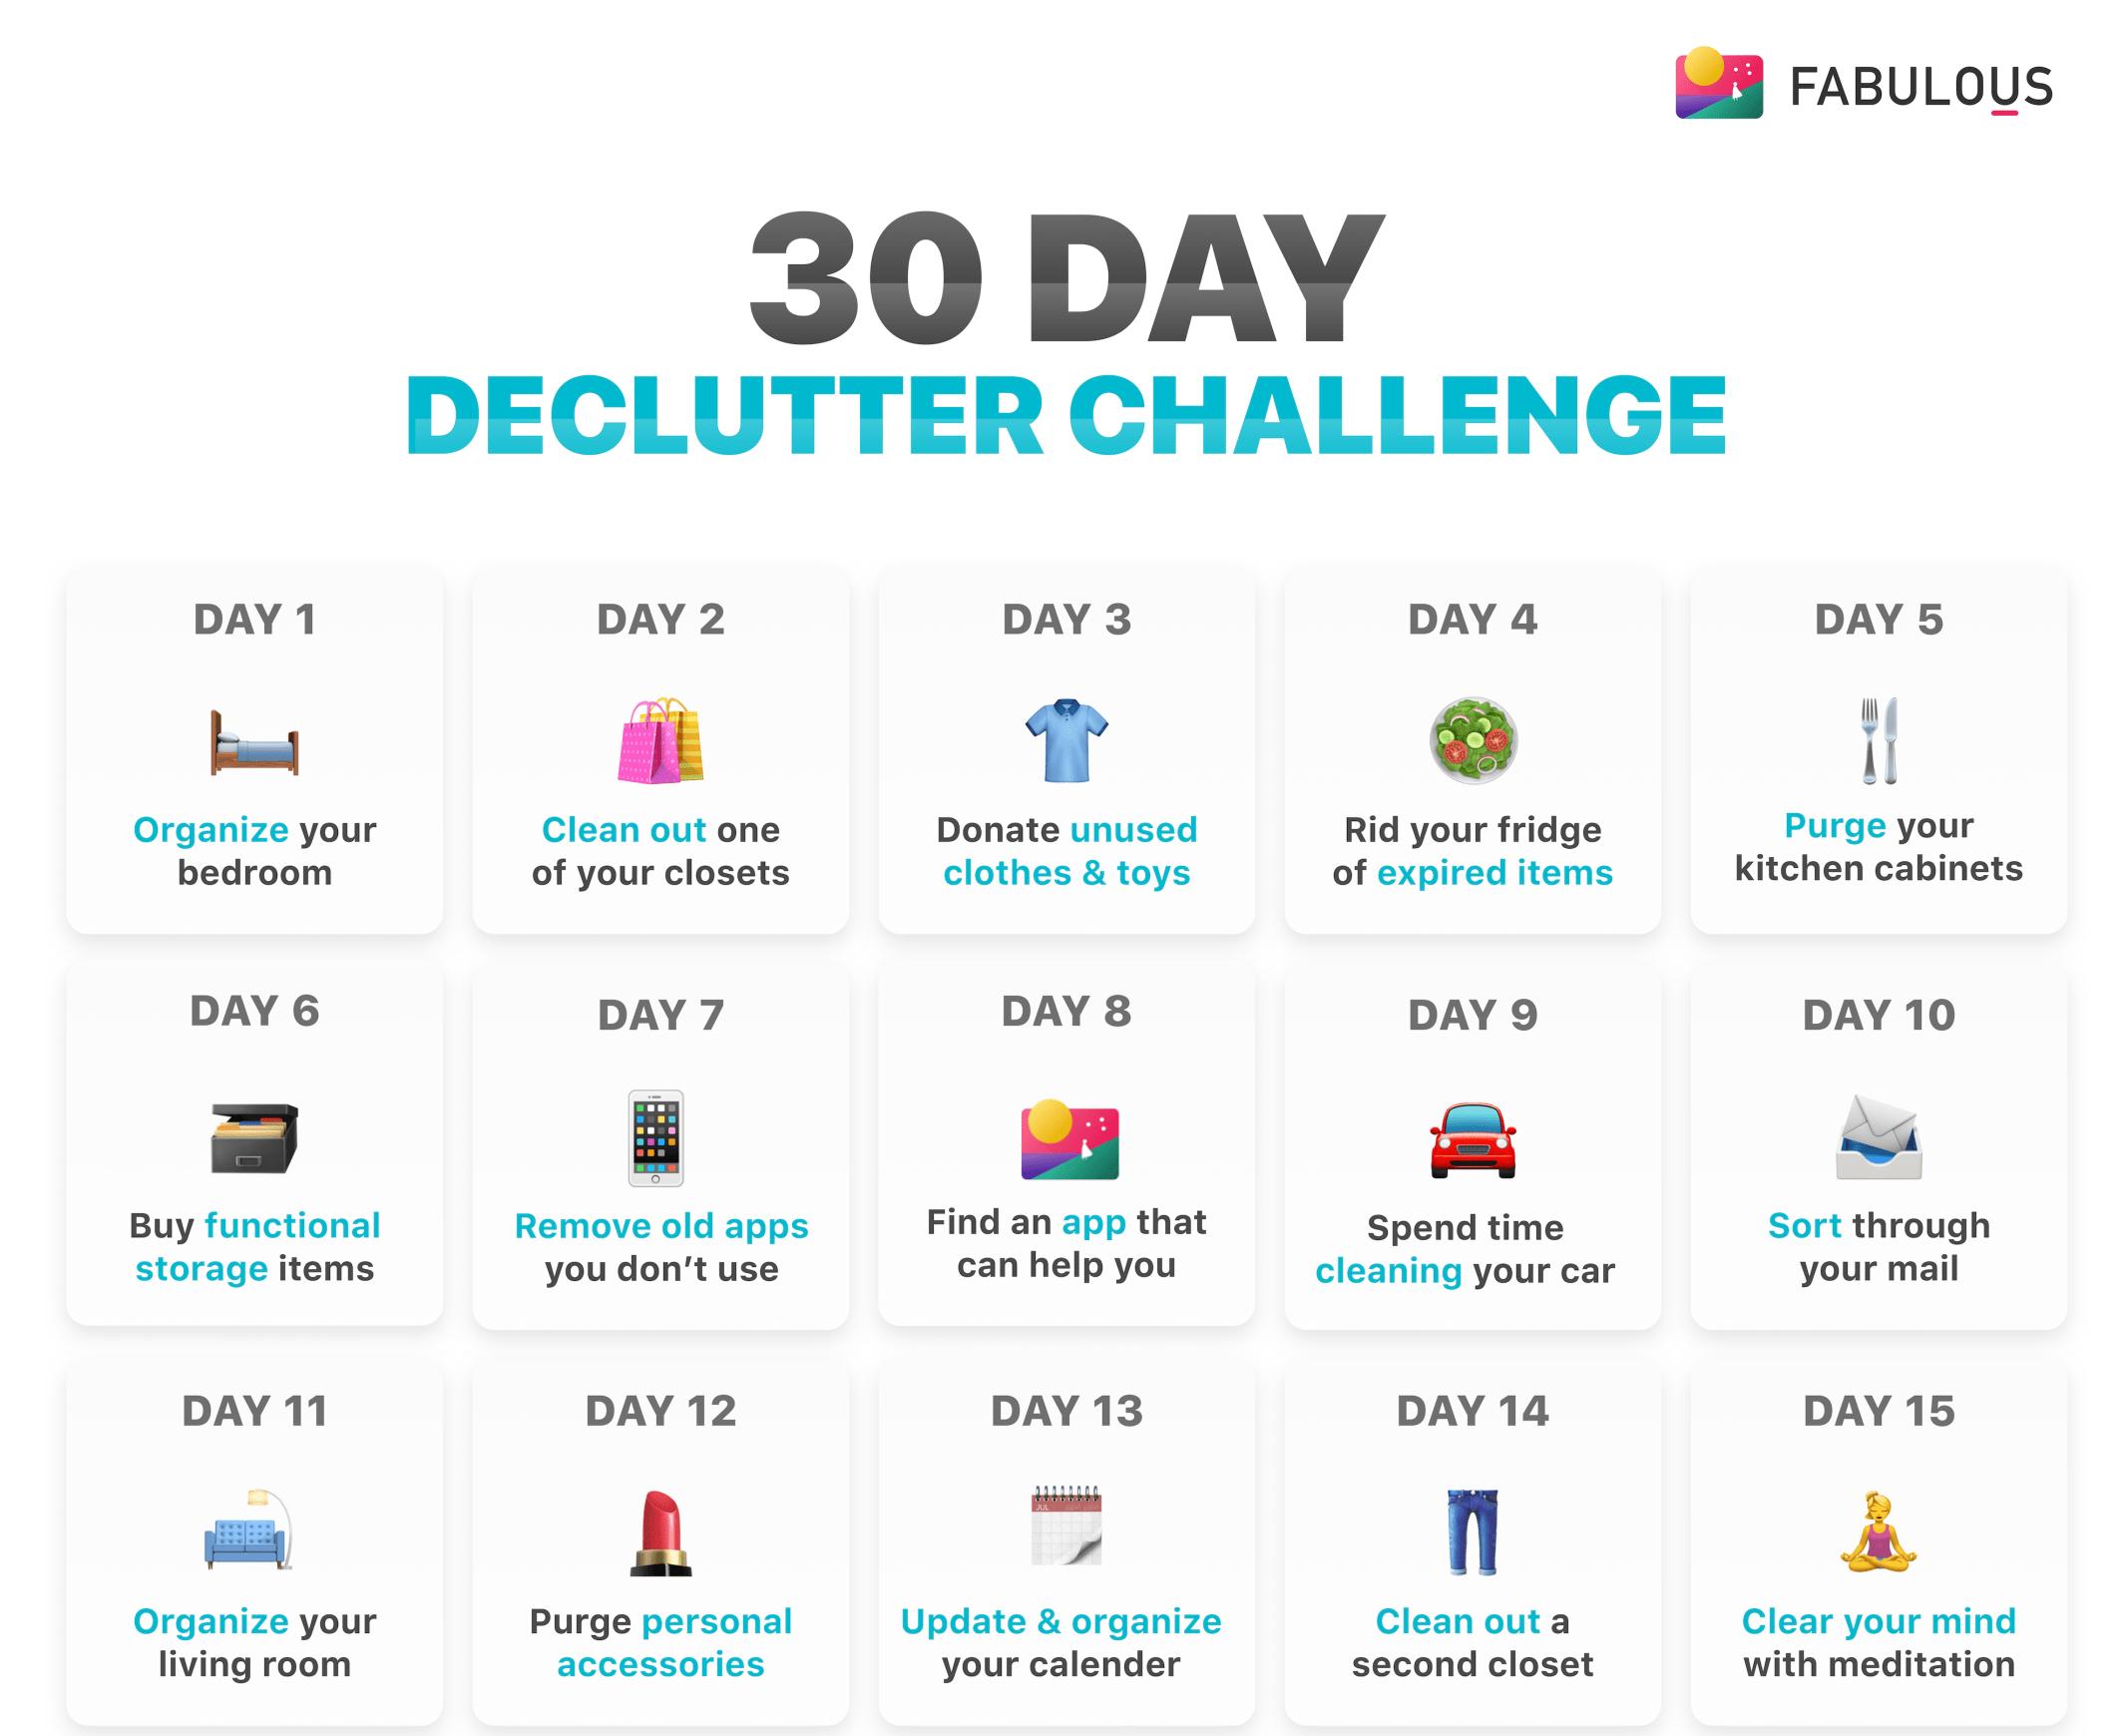 30 Day Declutter Challenge  Minimalist.mindset  Medium inside 30 Day Declutter Calendar